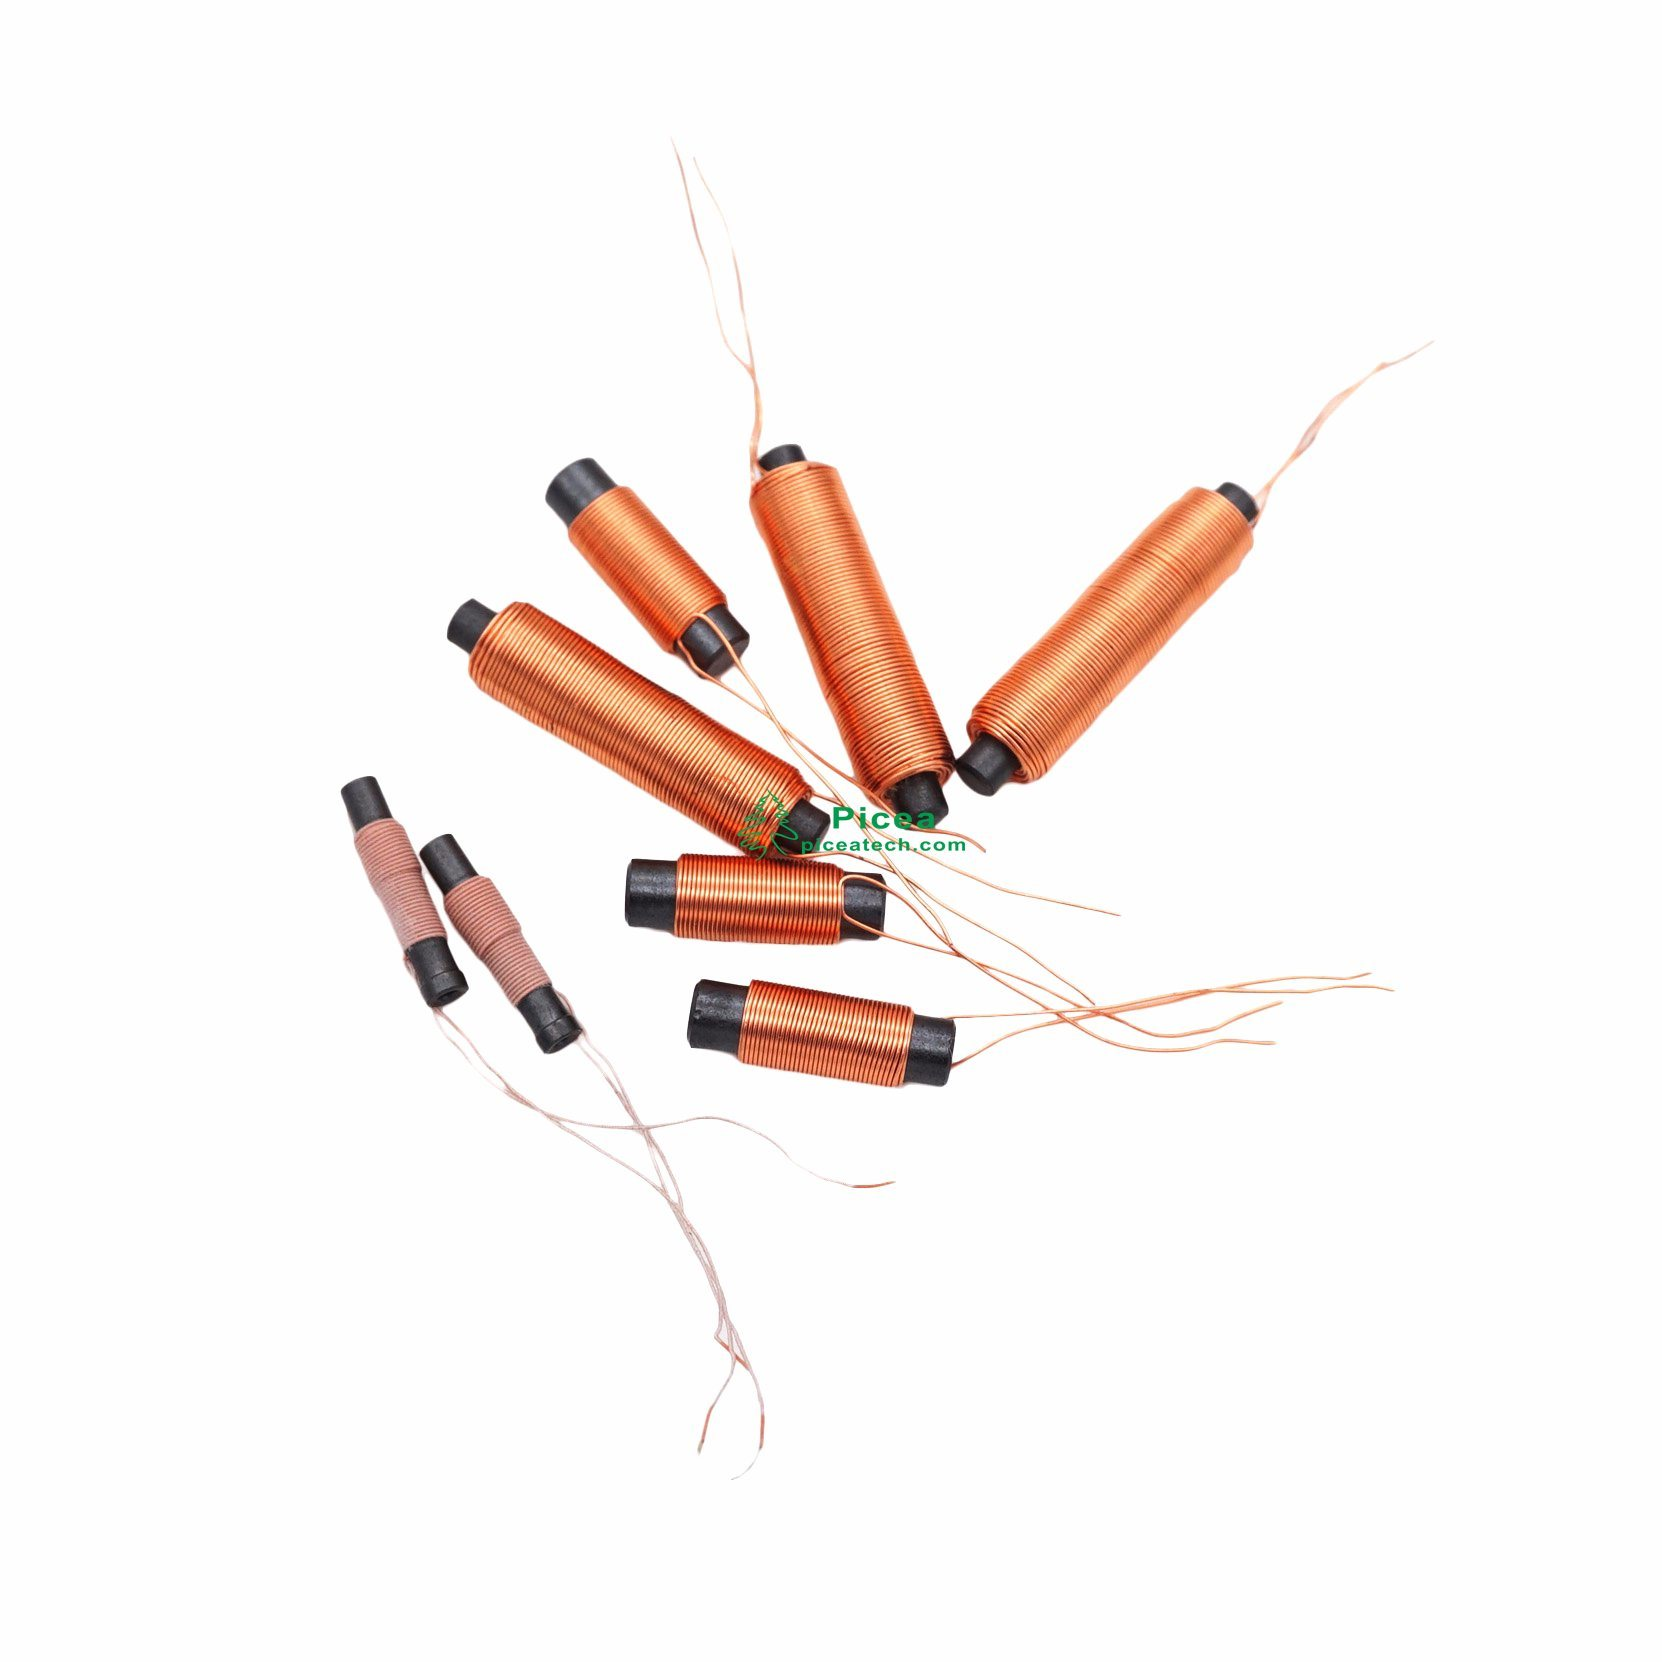 Coil Bobbins for Ferrite Cores Inductor (bobbin coil)